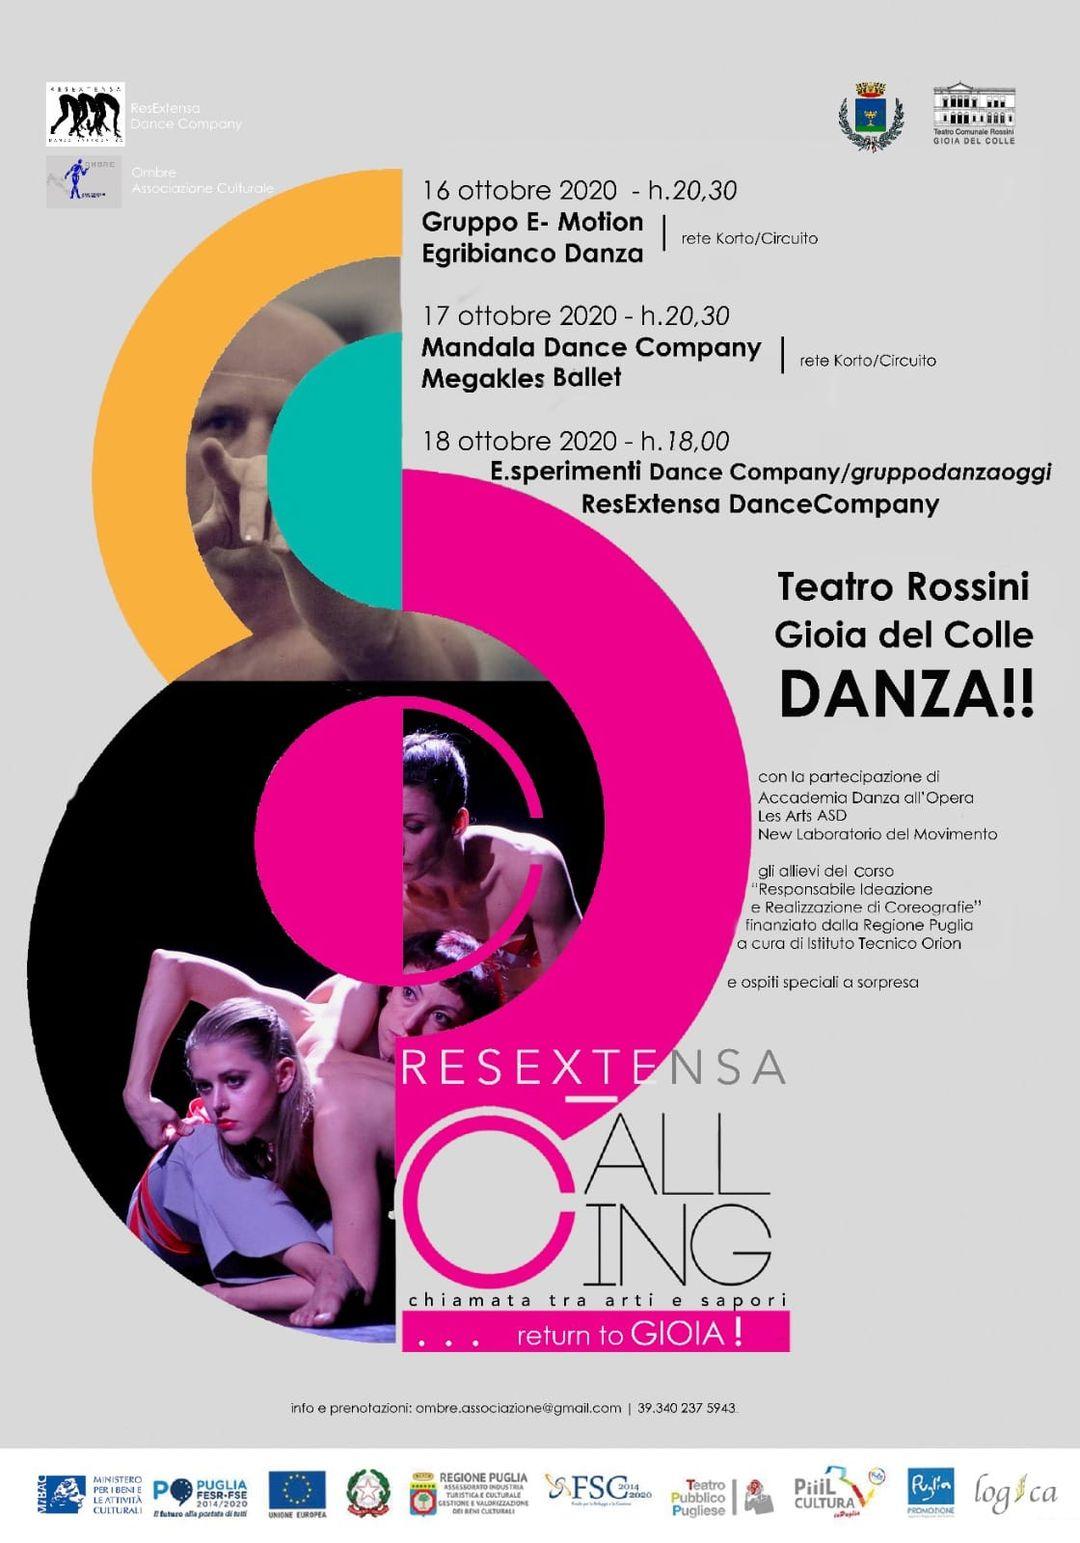 locandina-Res-Extensa-calling